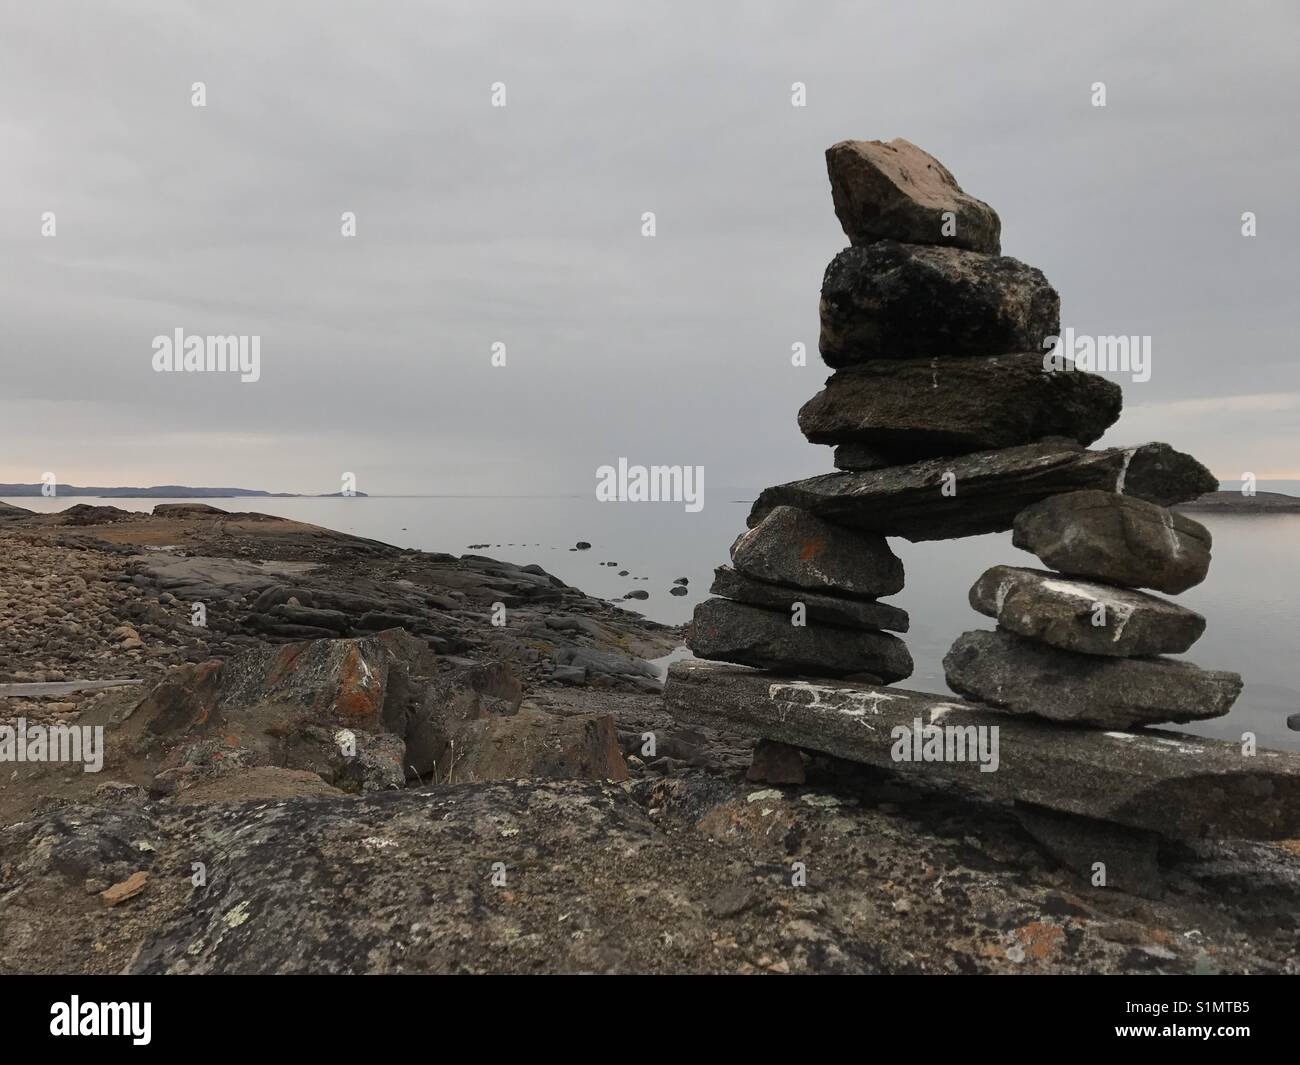 Inukshuk on Arctic landscape near Iqaluit, Nunavut, Canada - Stock Image